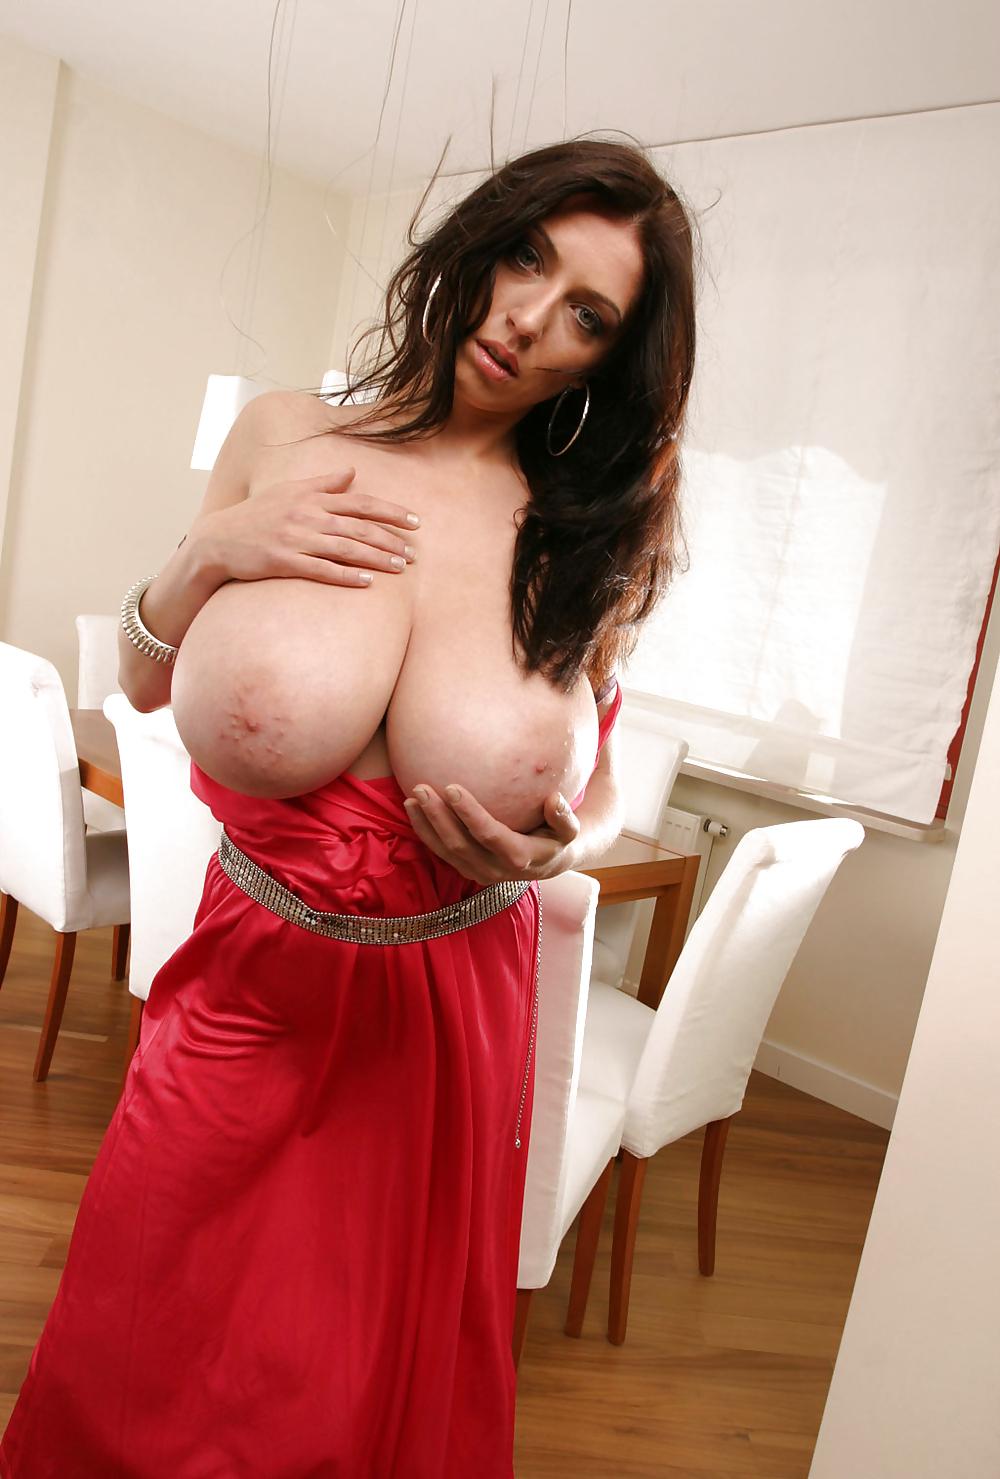 take-virginity-anya-big-tits-sex-videos